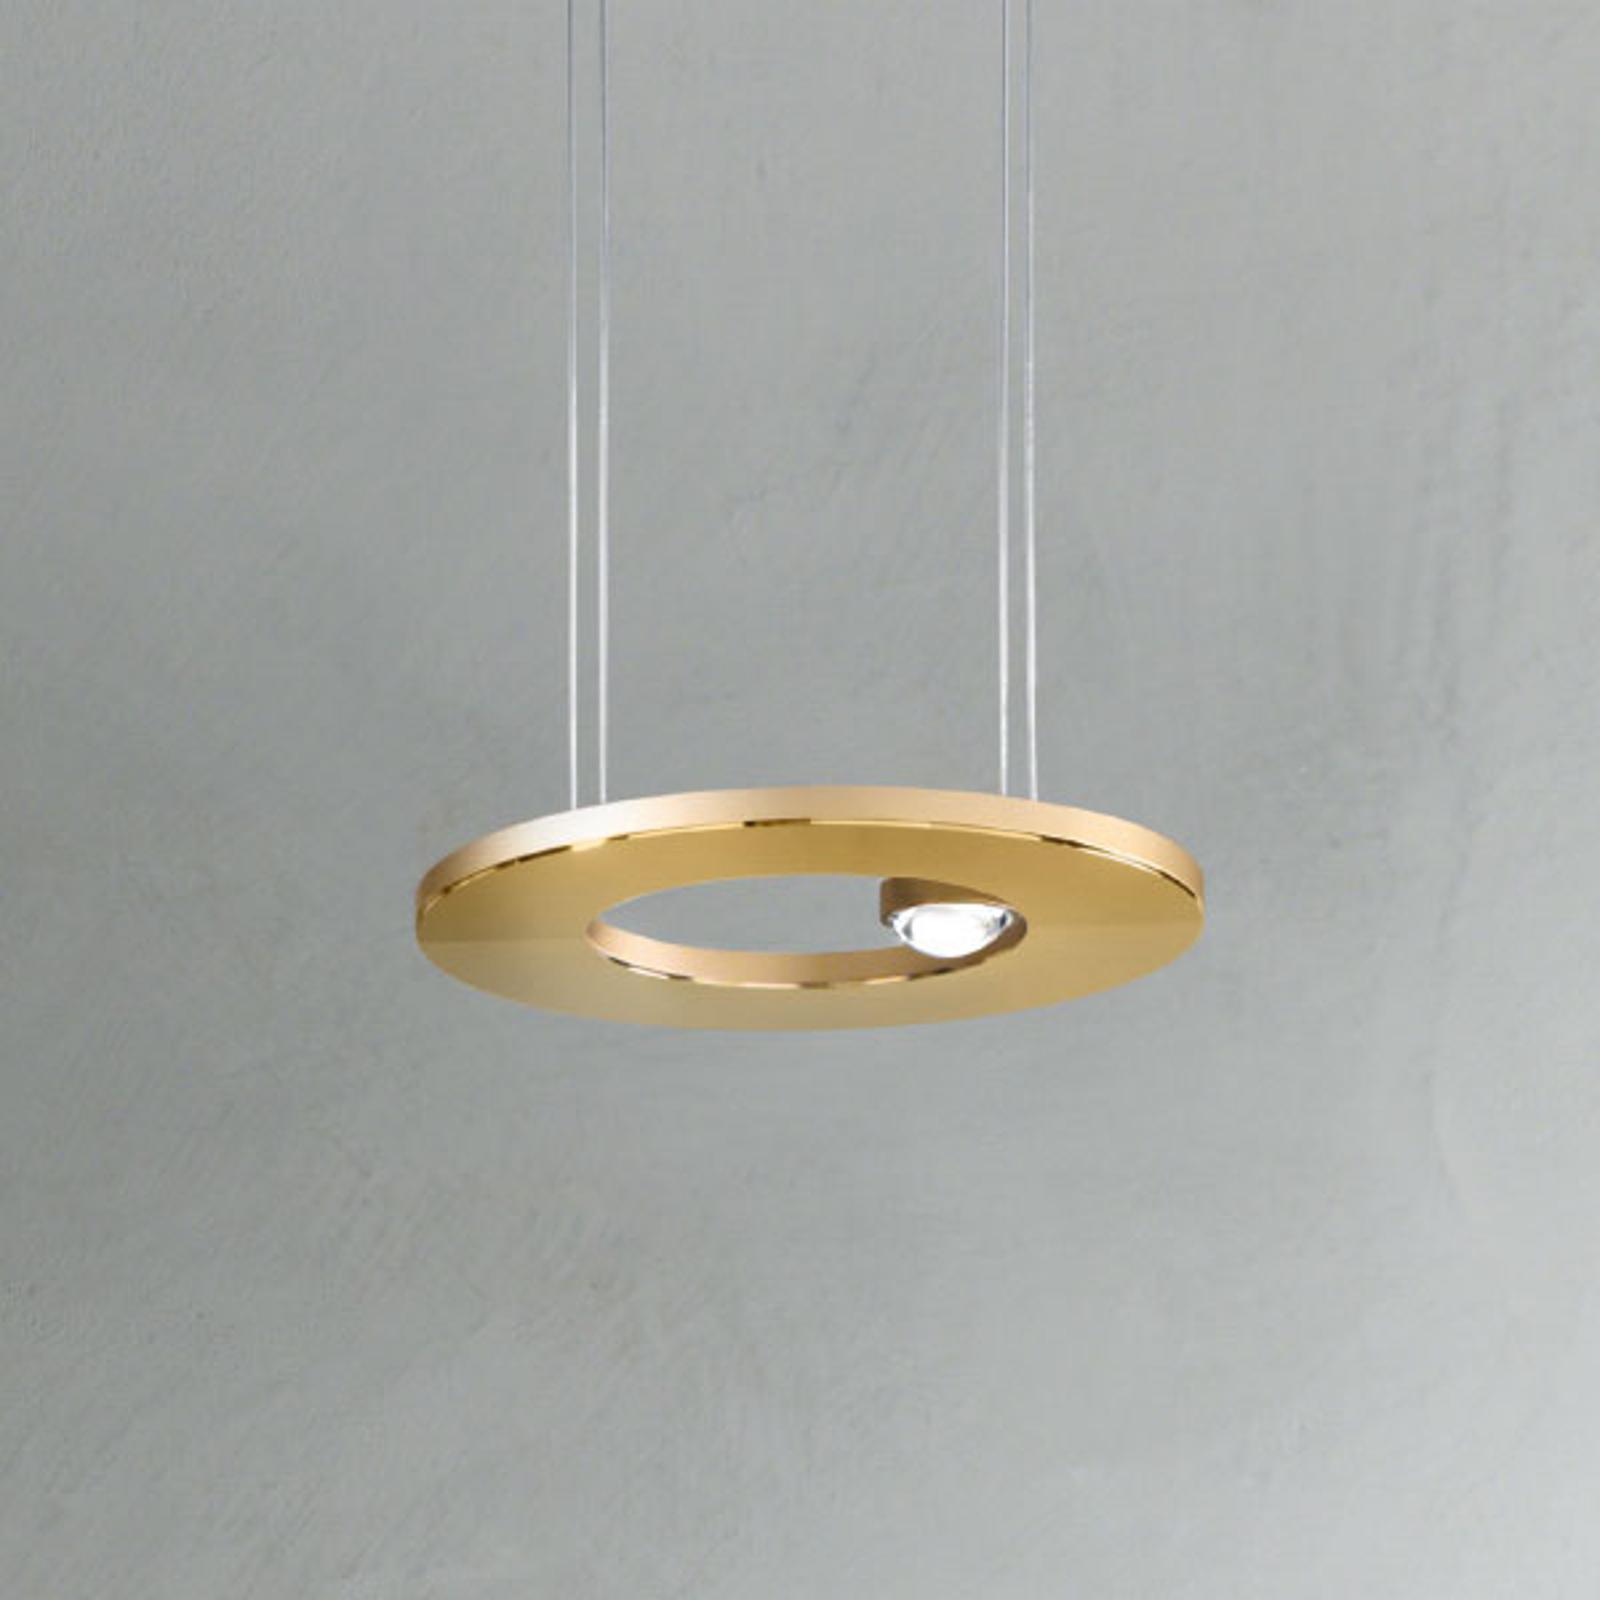 Cini&Nils Passepartout25 lampada sospensione LED